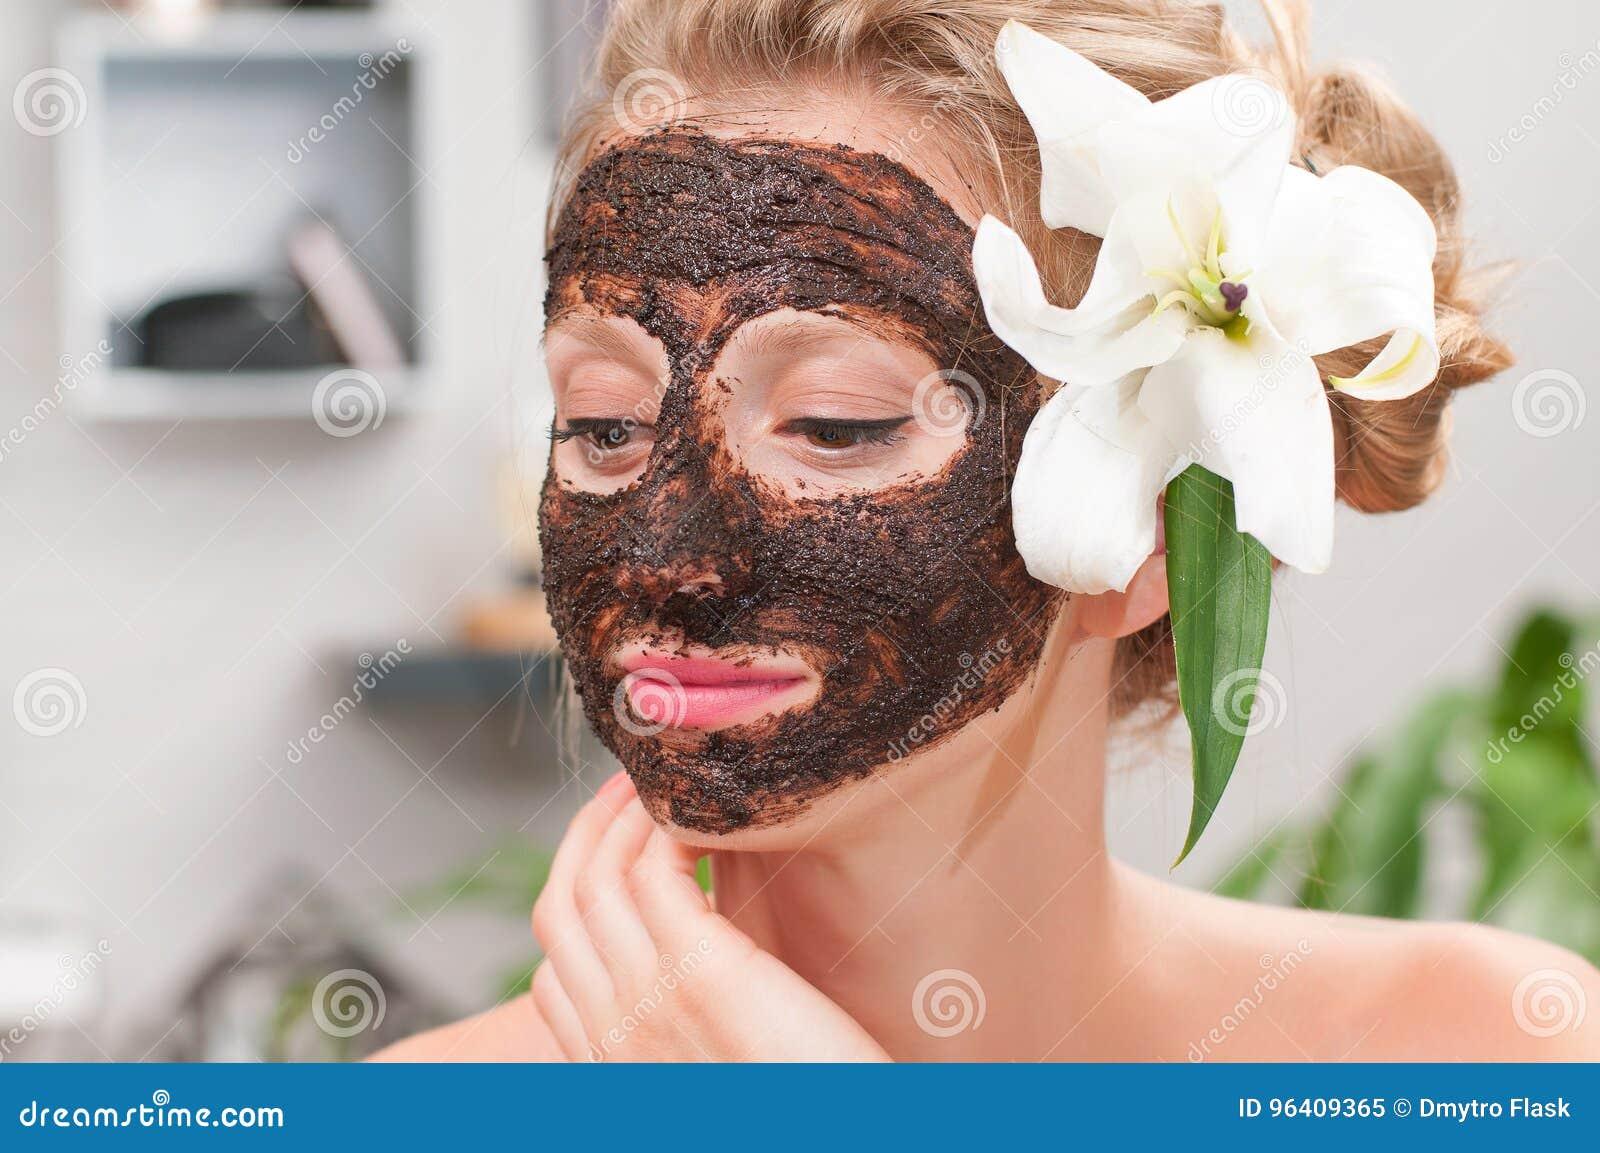 Spa salon. Beautiful woman with coffee facial mask at beauty salon